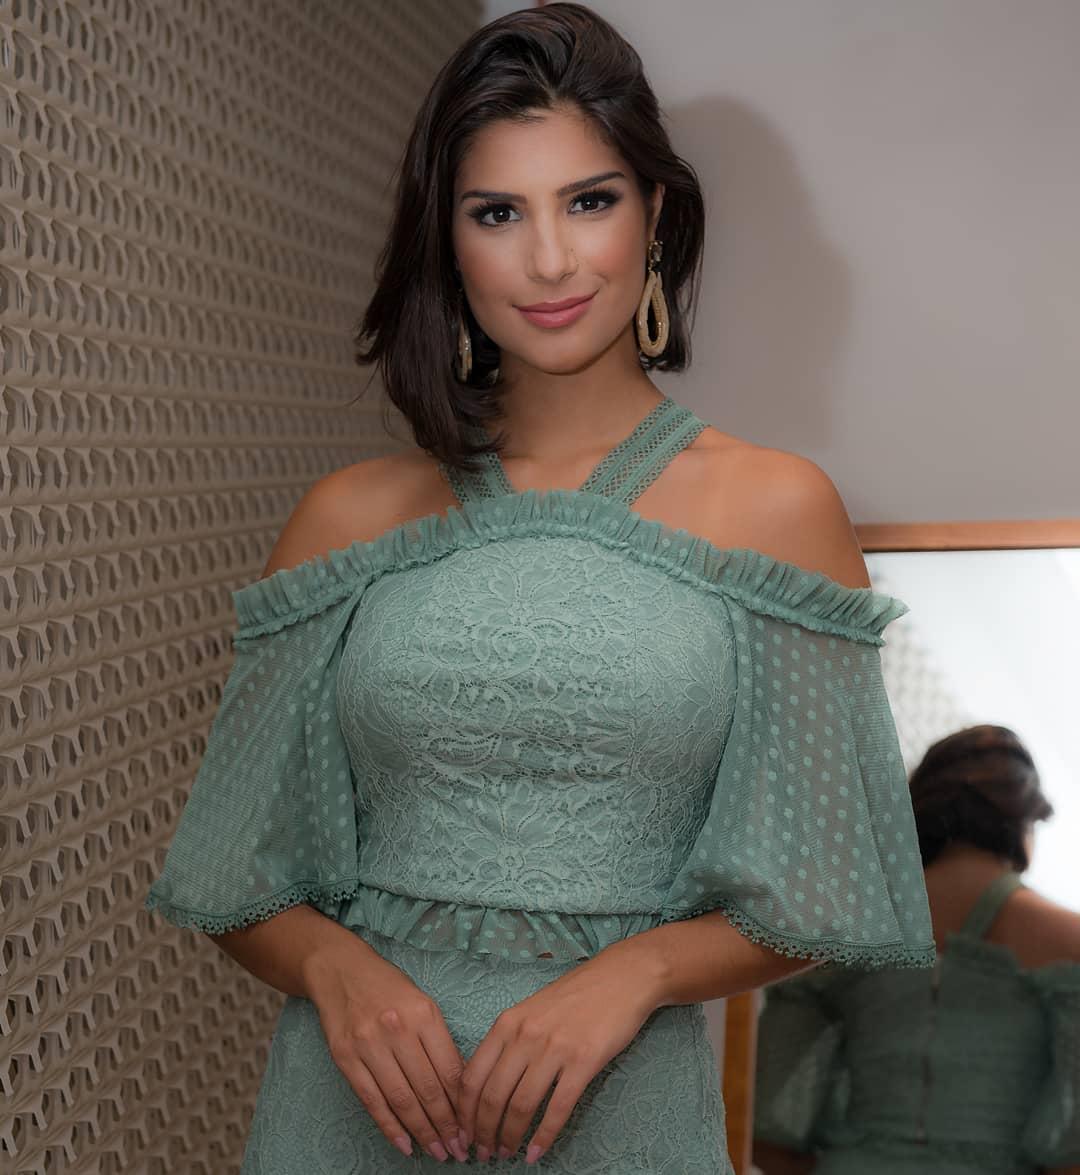 julia horta, miss brasil universo 2019/top 2 de reynado internacional cafe 2016, top 5 de miss tourism international 2017. - Página 22 53364413